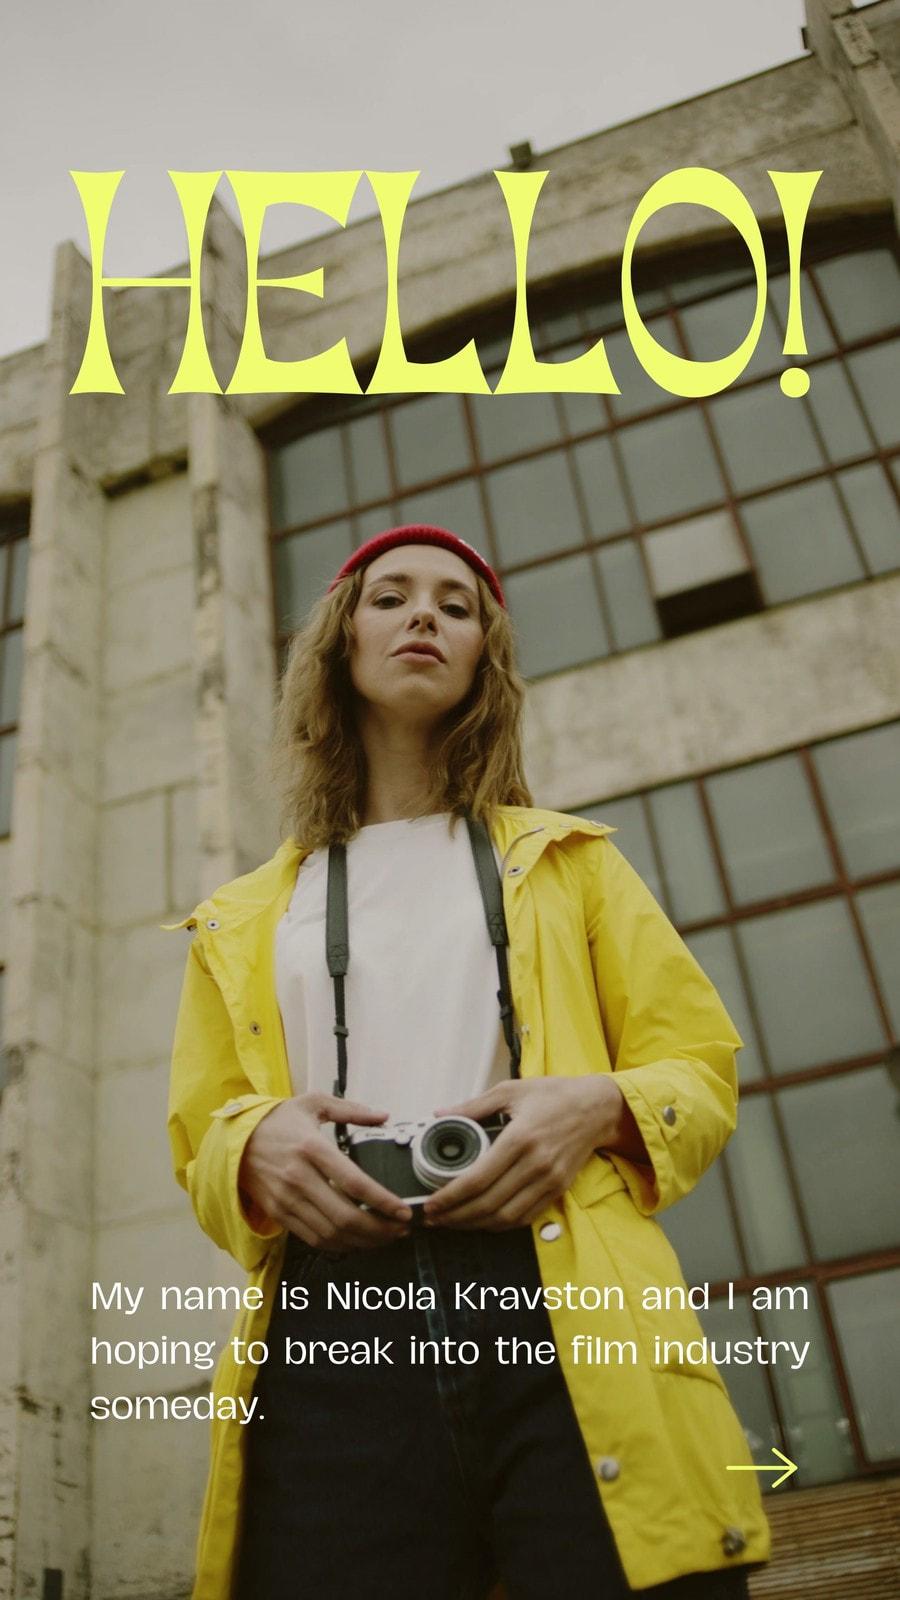 Yellow Brown Modern Photo-centric College Graduate Job Seeker Film Industry Digital Video Resume Tiktok Video